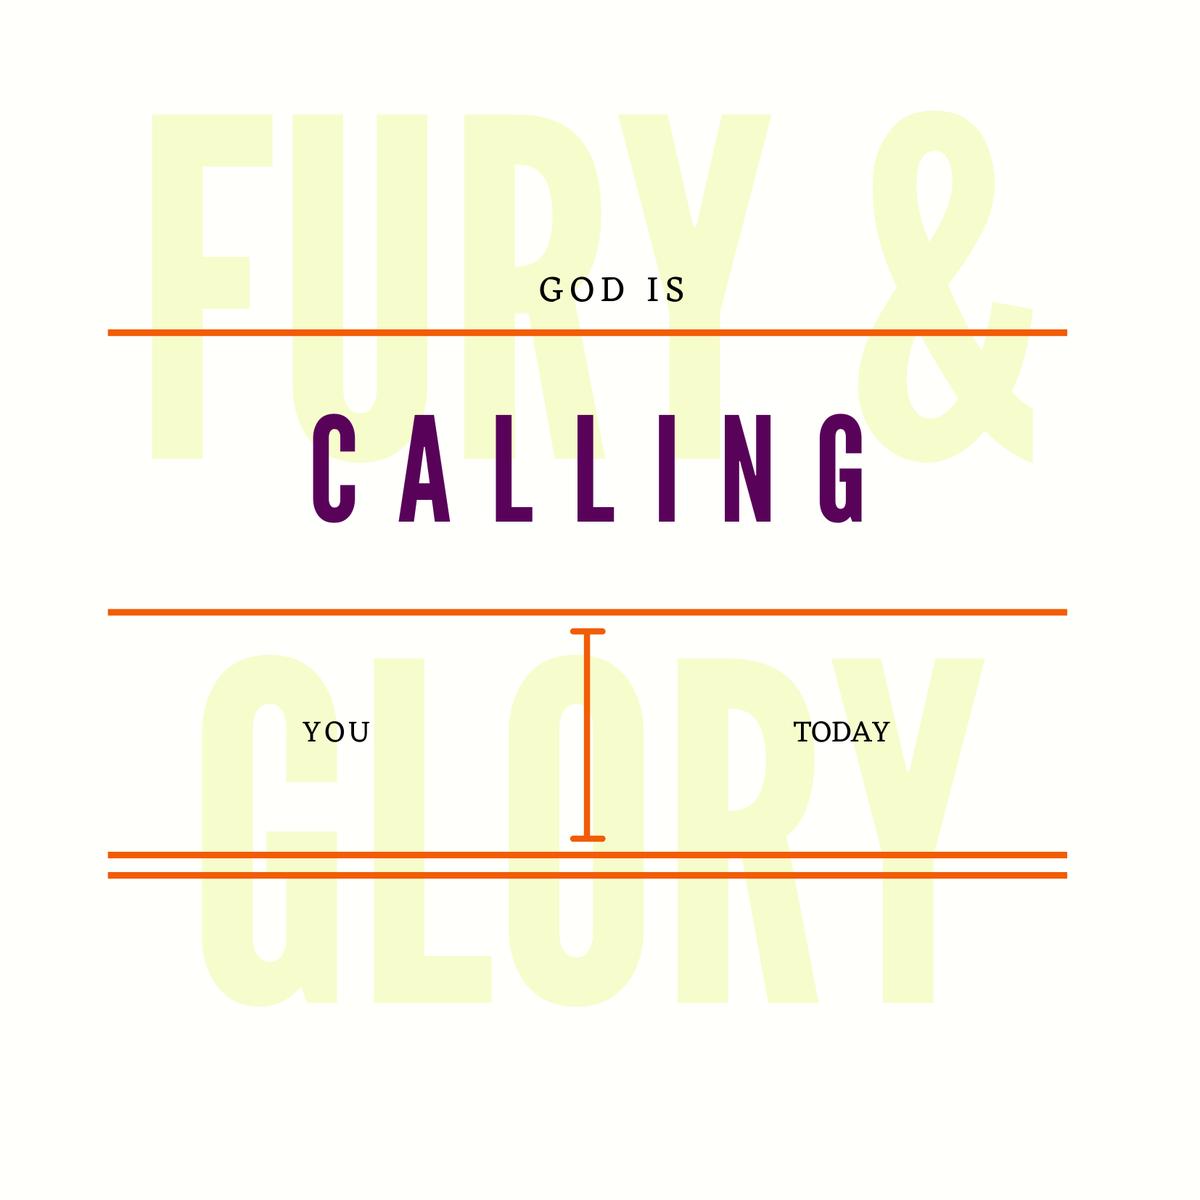 God has always been in the business of calling people back to himself. . . . . . #westwindschurch #jacksonmi #furyandglory #ezekiel #calling #godscalling #godpursues #love #life #inspiration #christianspirituality #prophets